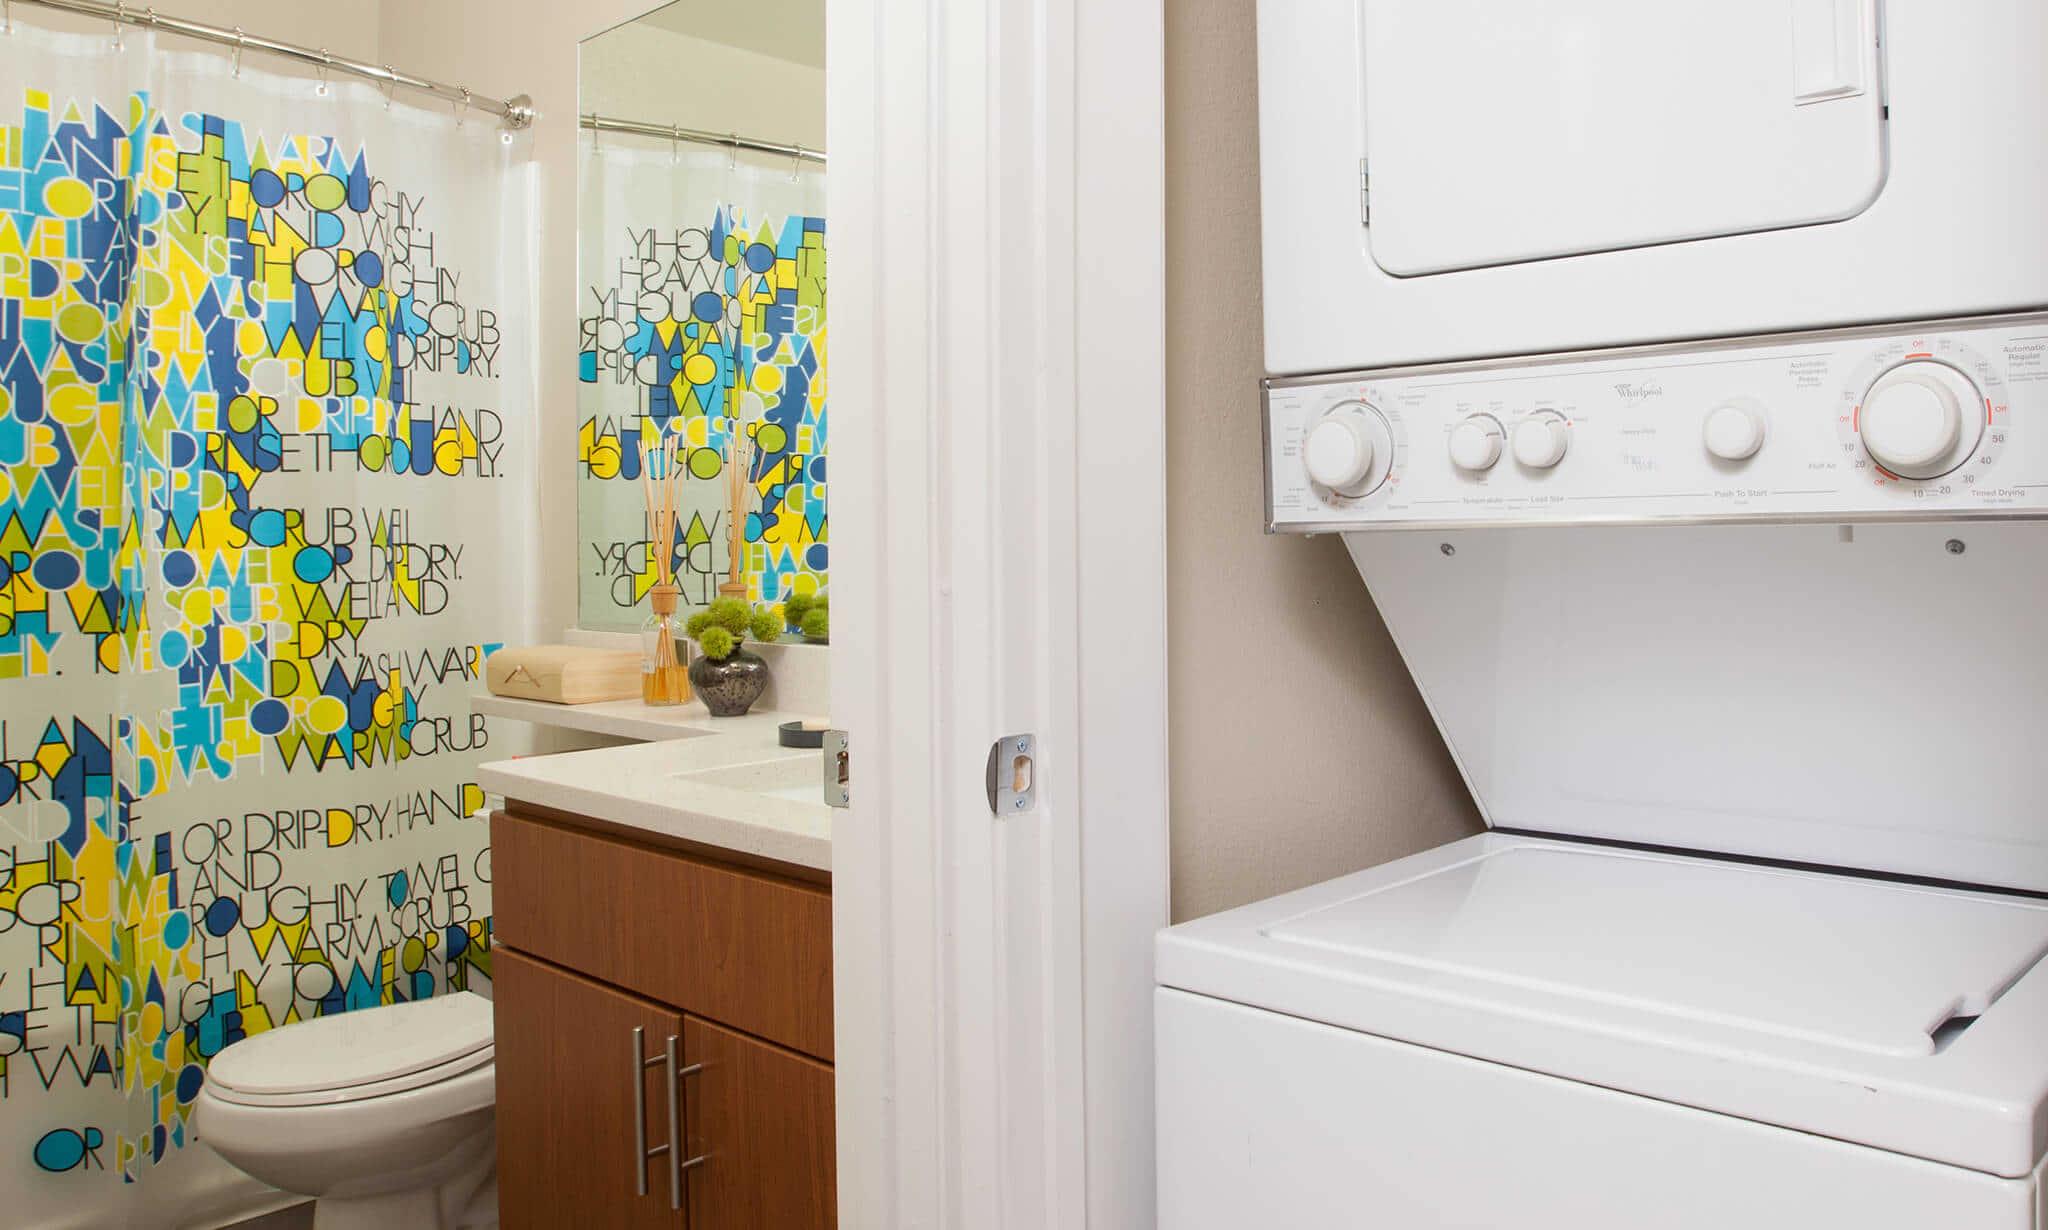 Alderwood Apartments apartments in Santa Clara CA to rent photo 14